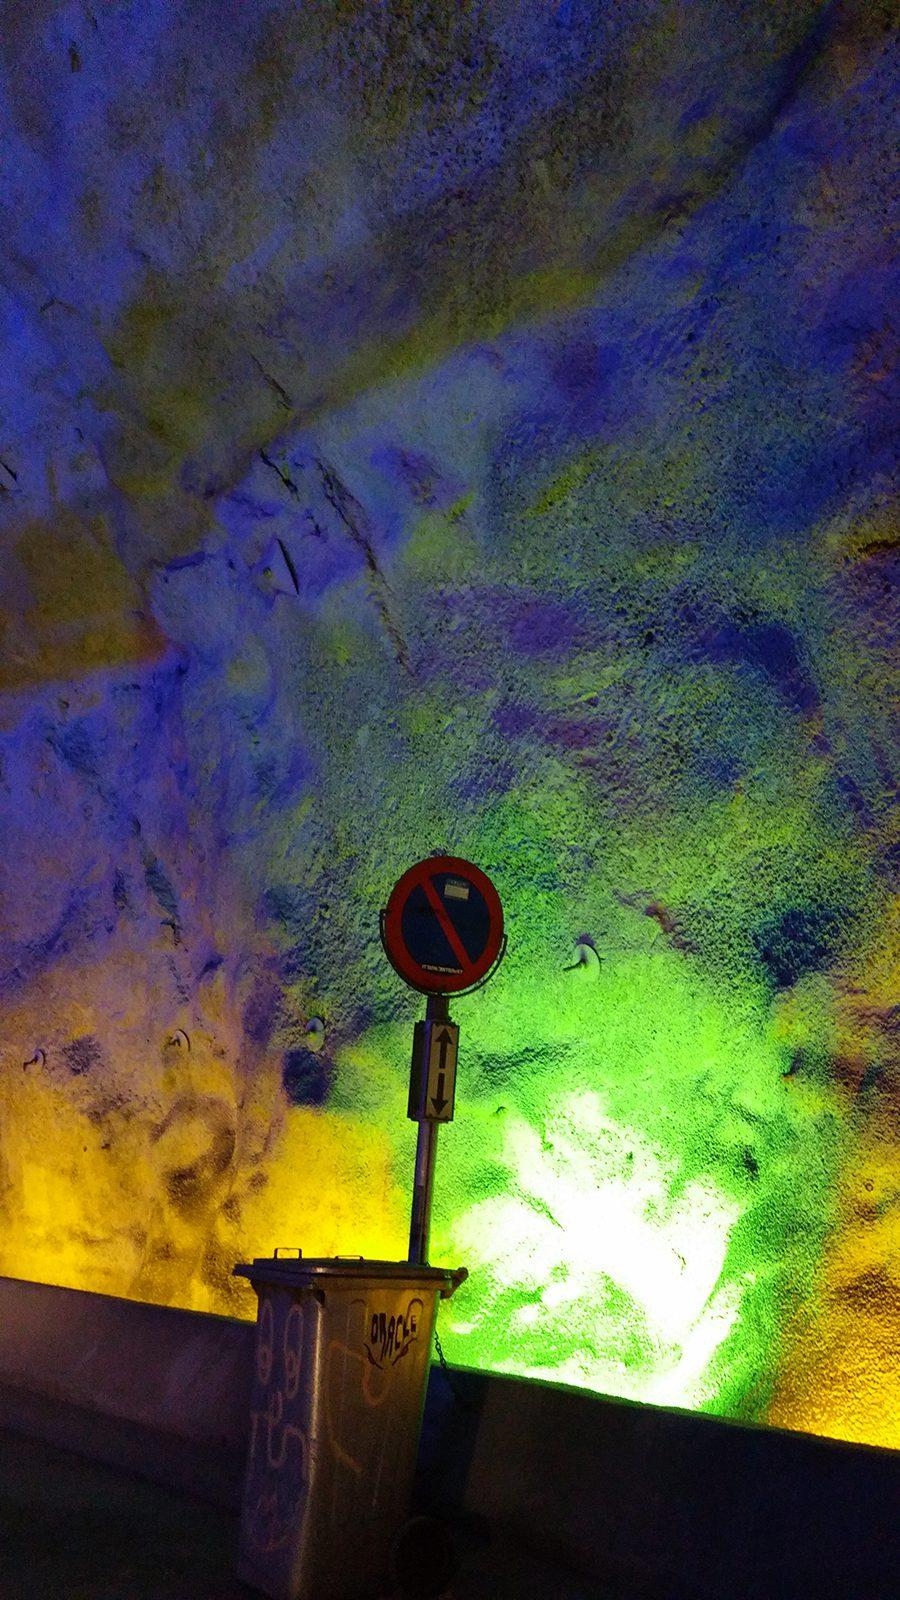 Professor of History Judy Kutulas took this photo inside Norway's brightly lit Lærdalstunnelen.